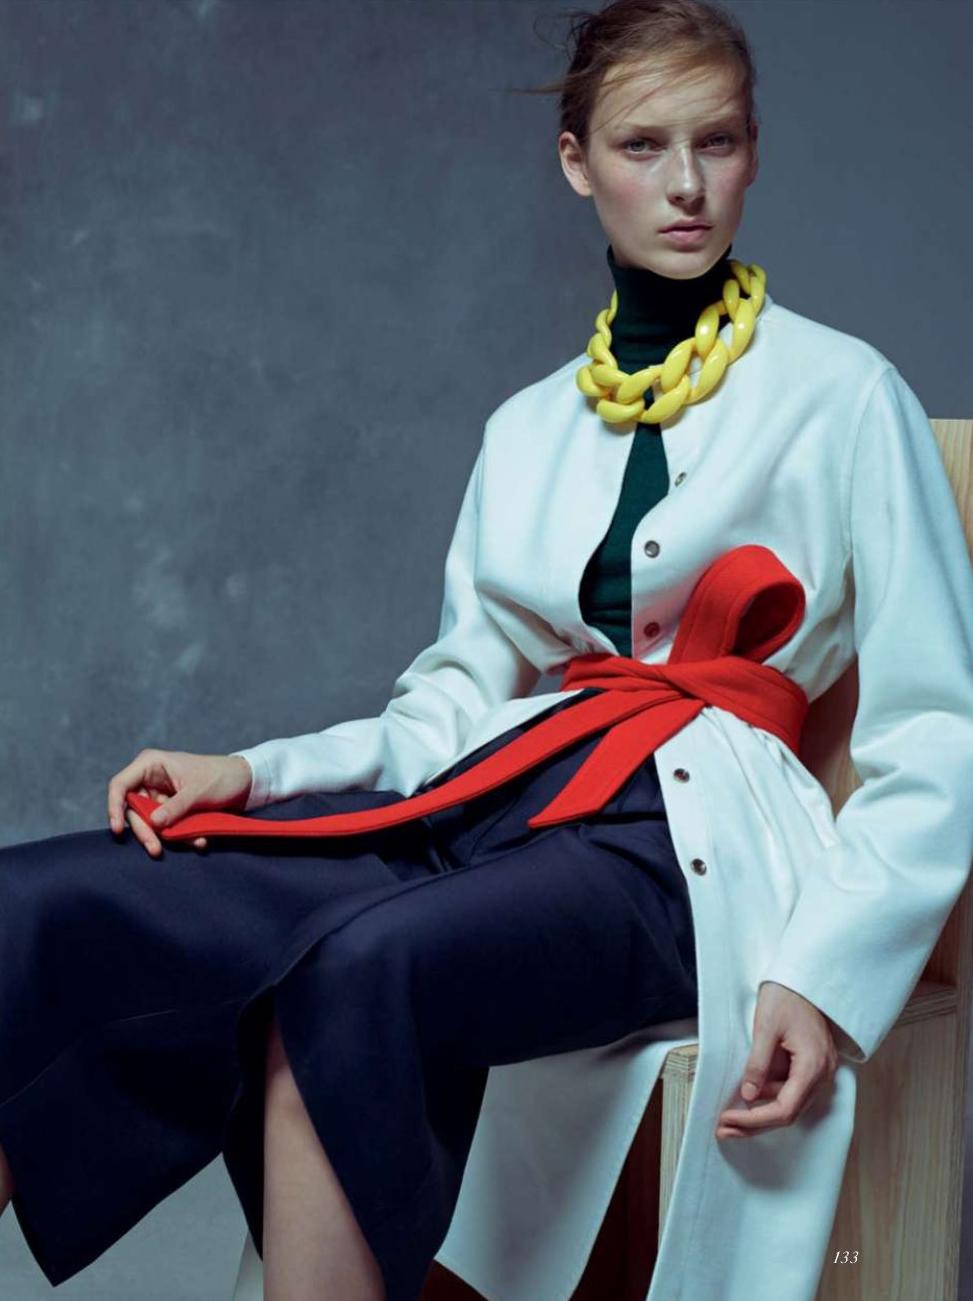 Karim-Sadli-Julia-Bergshoeff-Vogue-UK-January-2015-1.jpg